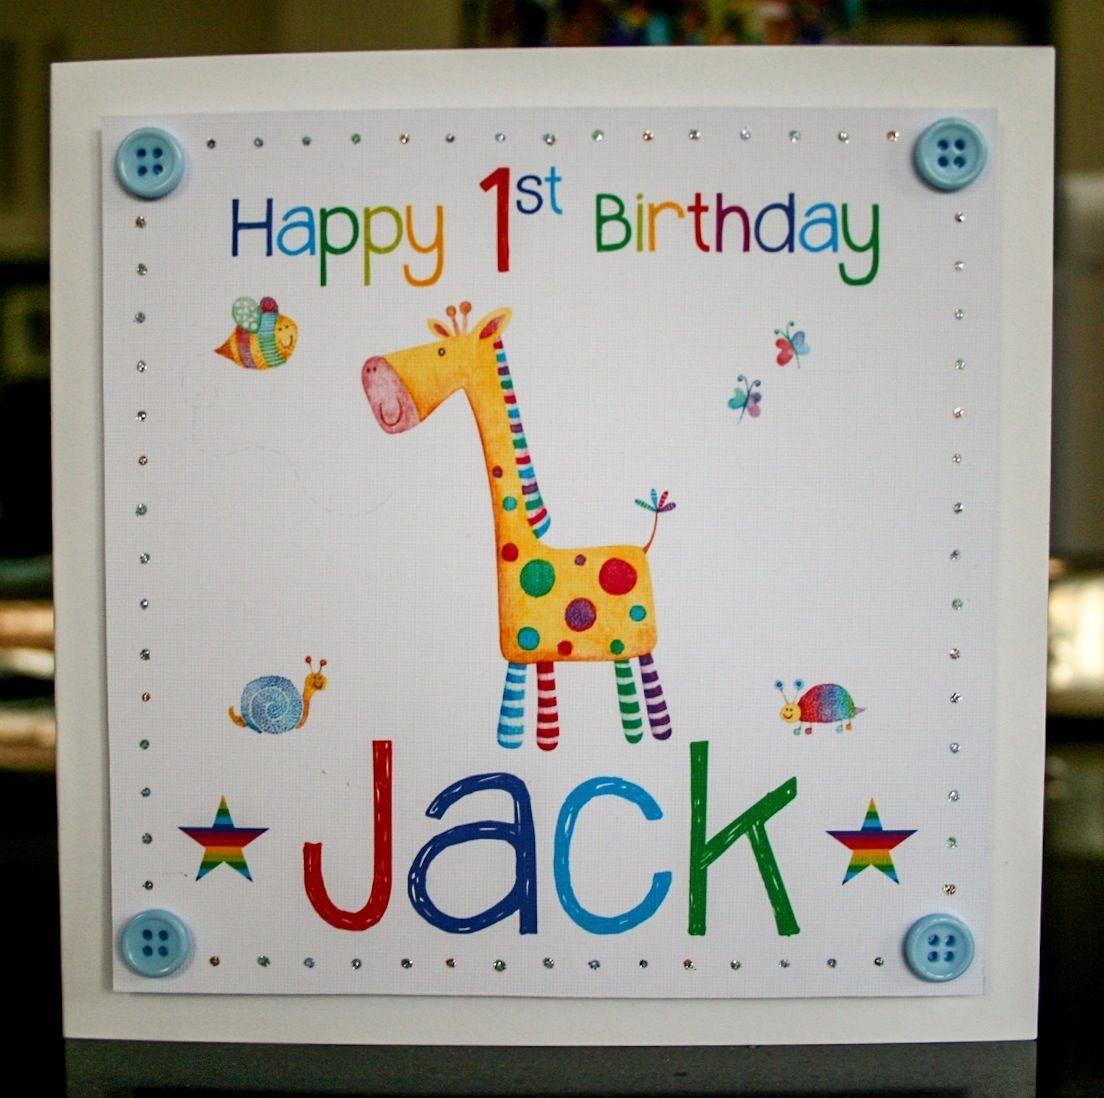 Handmade personalised 1st birthday card by michaela de latour handmade personalised 1st birthday card by michaela de latour bookmarktalkfo Image collections